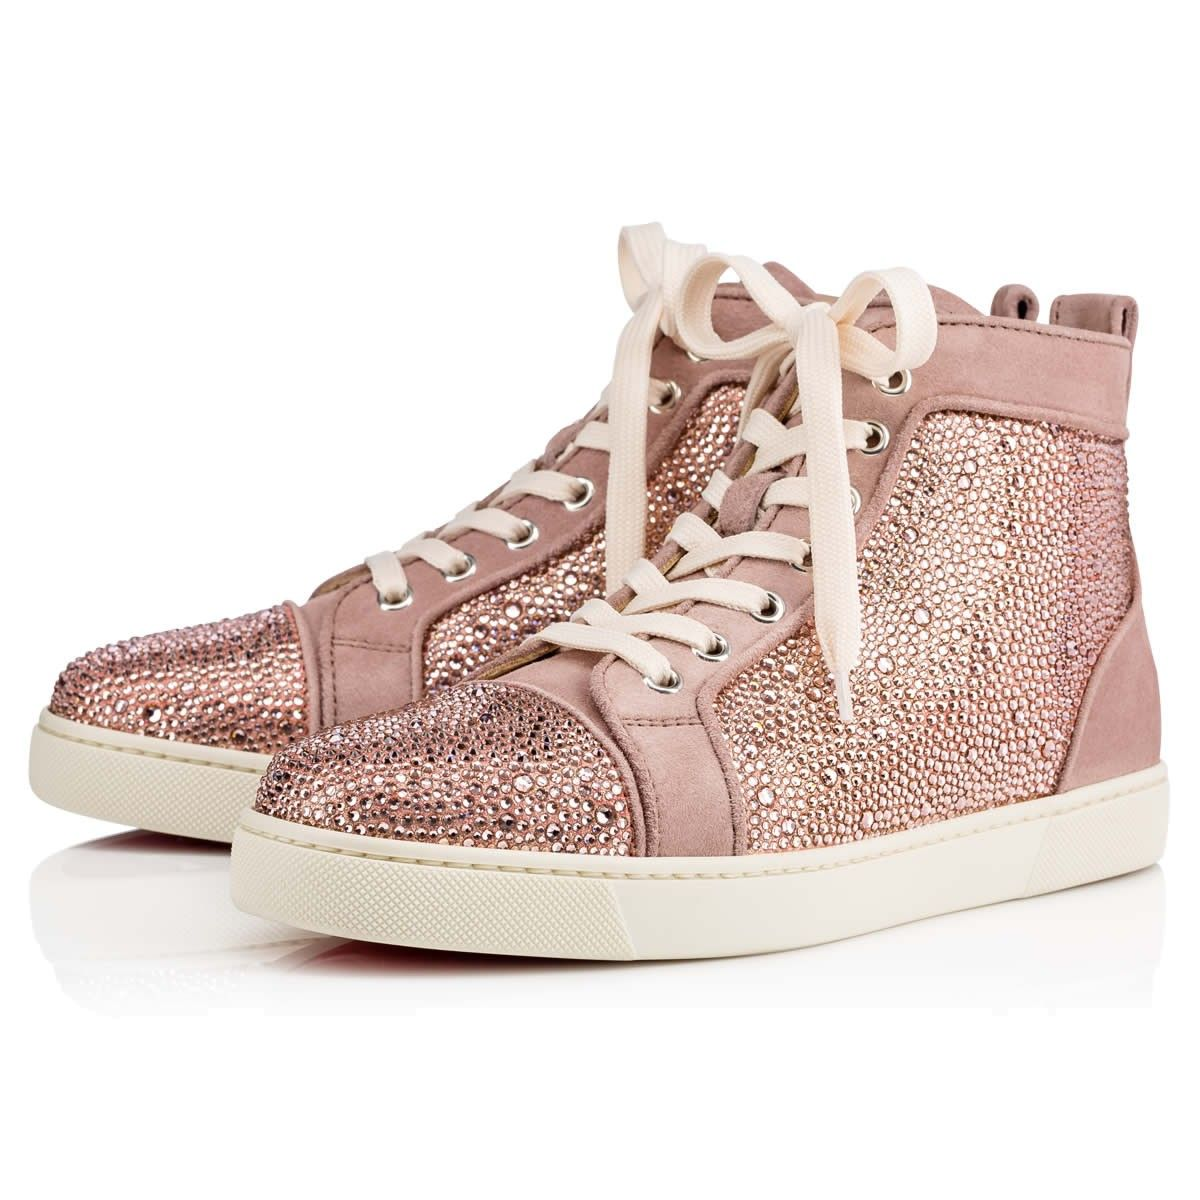 fe8208298375 Louis Women s Flat Version Rose Antique Suede - Women Shoes - Christian  Louboutin  3295.